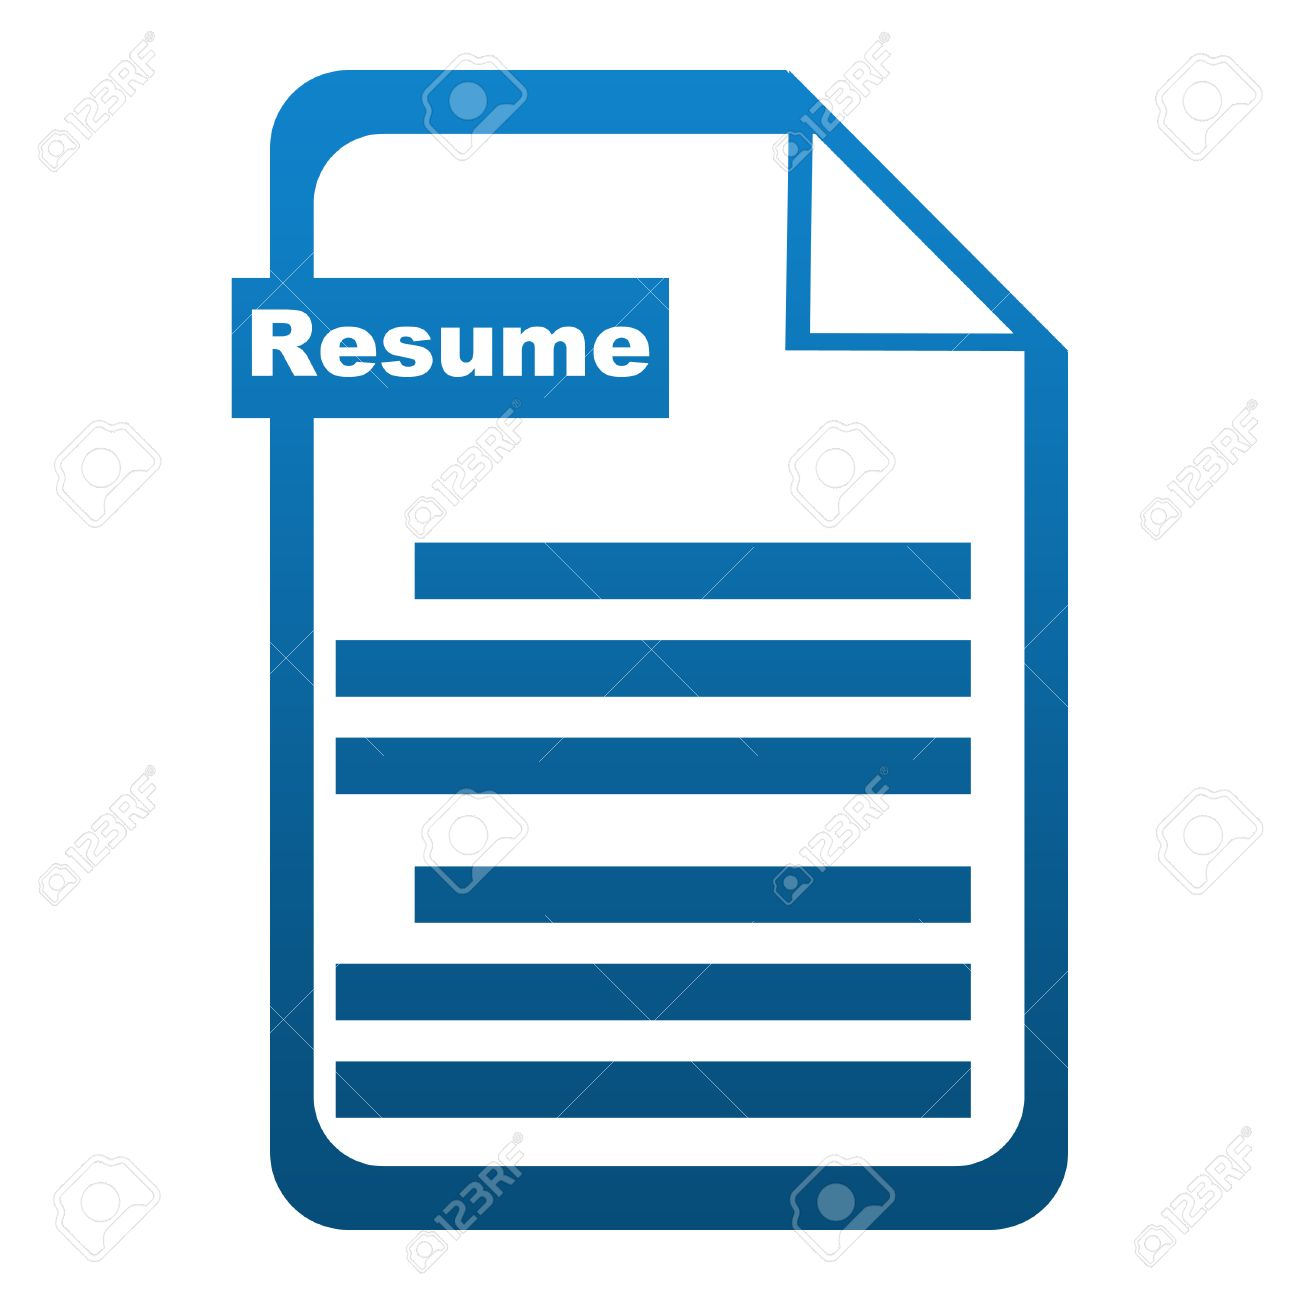 resume icon blue - Resume Icon